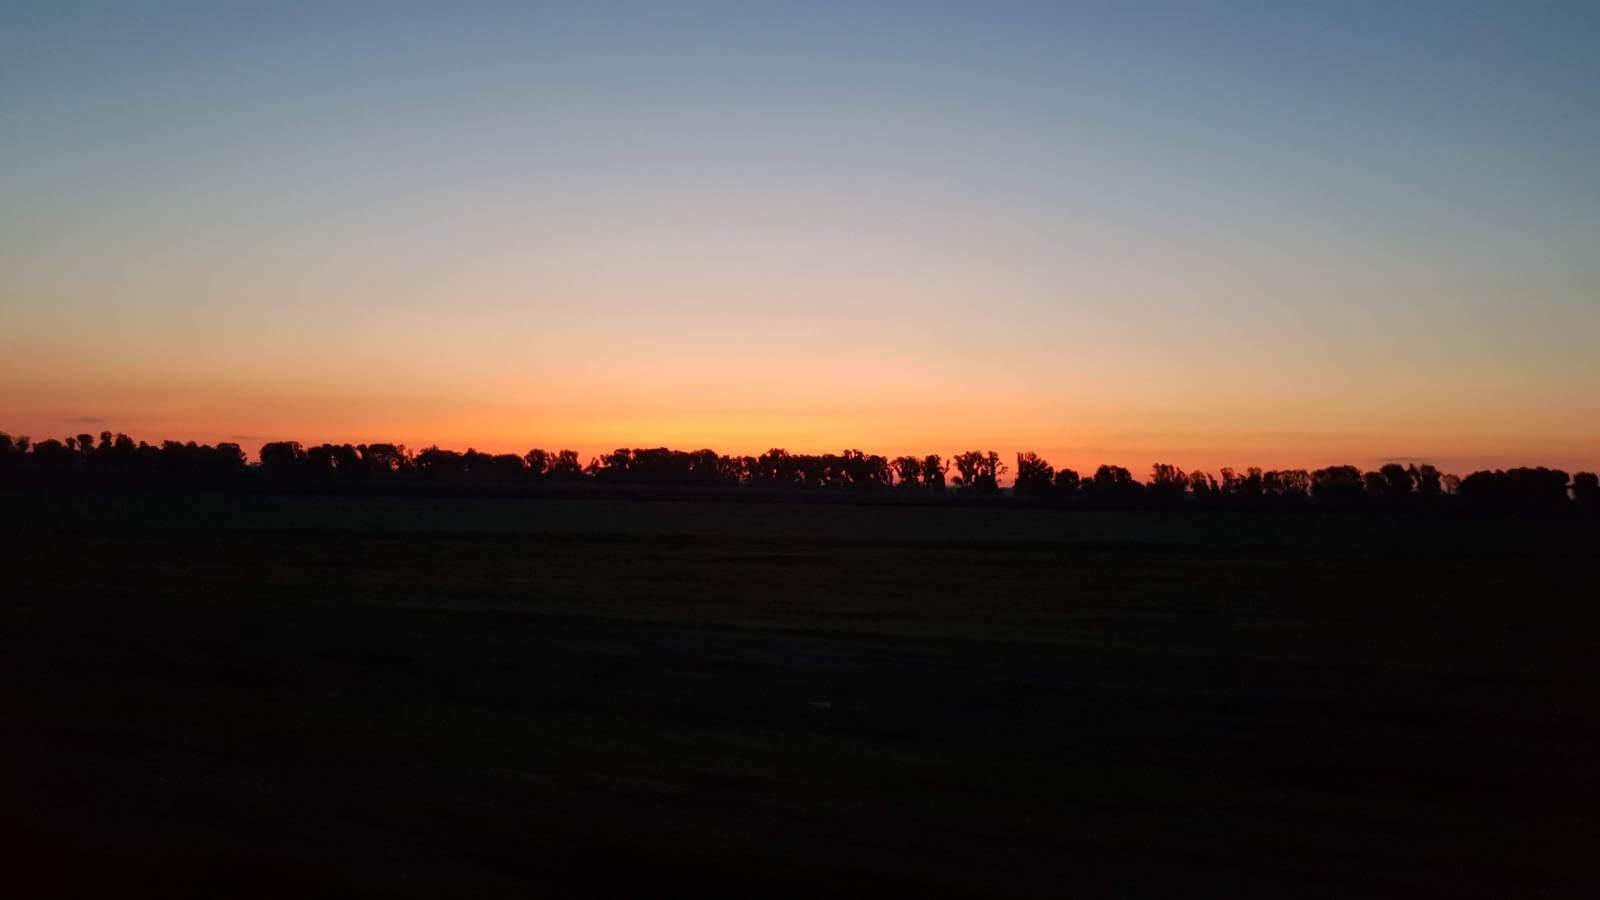 Na Westerplatte - poranek